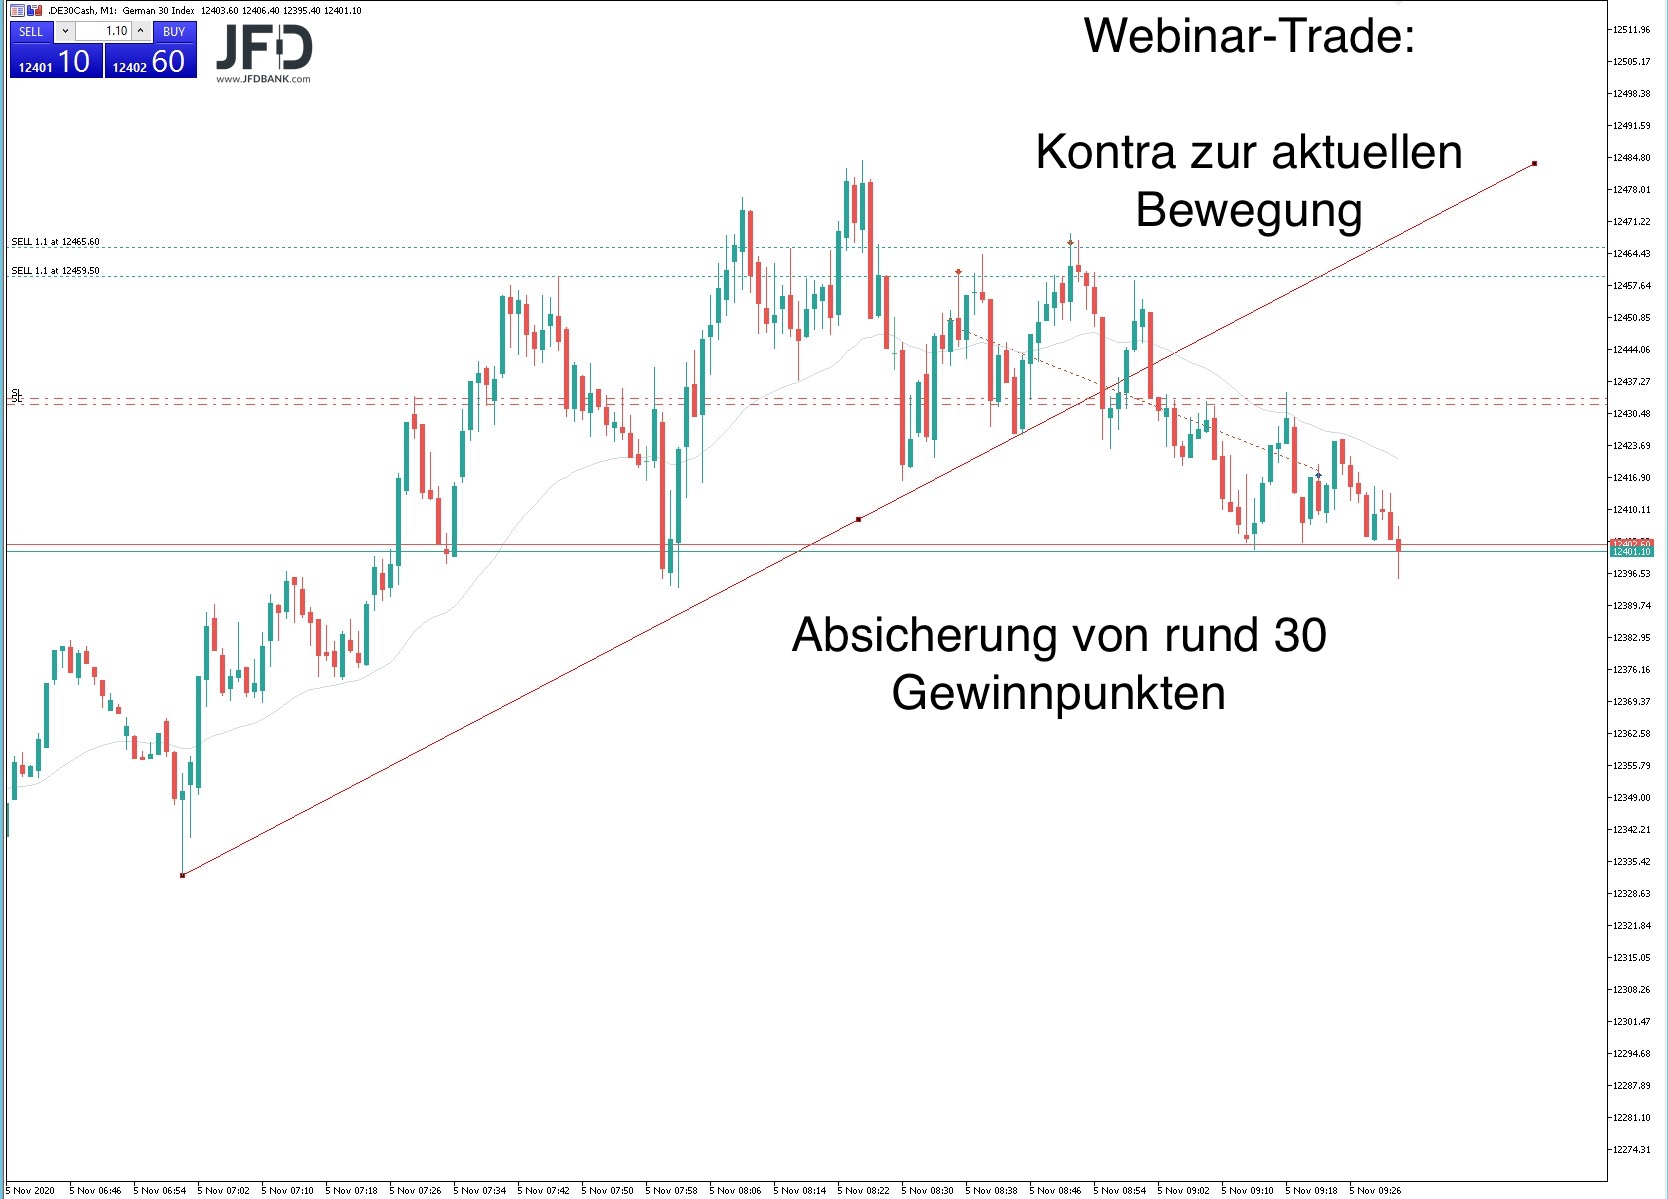 DAX-Trade im Livetrading Webinar